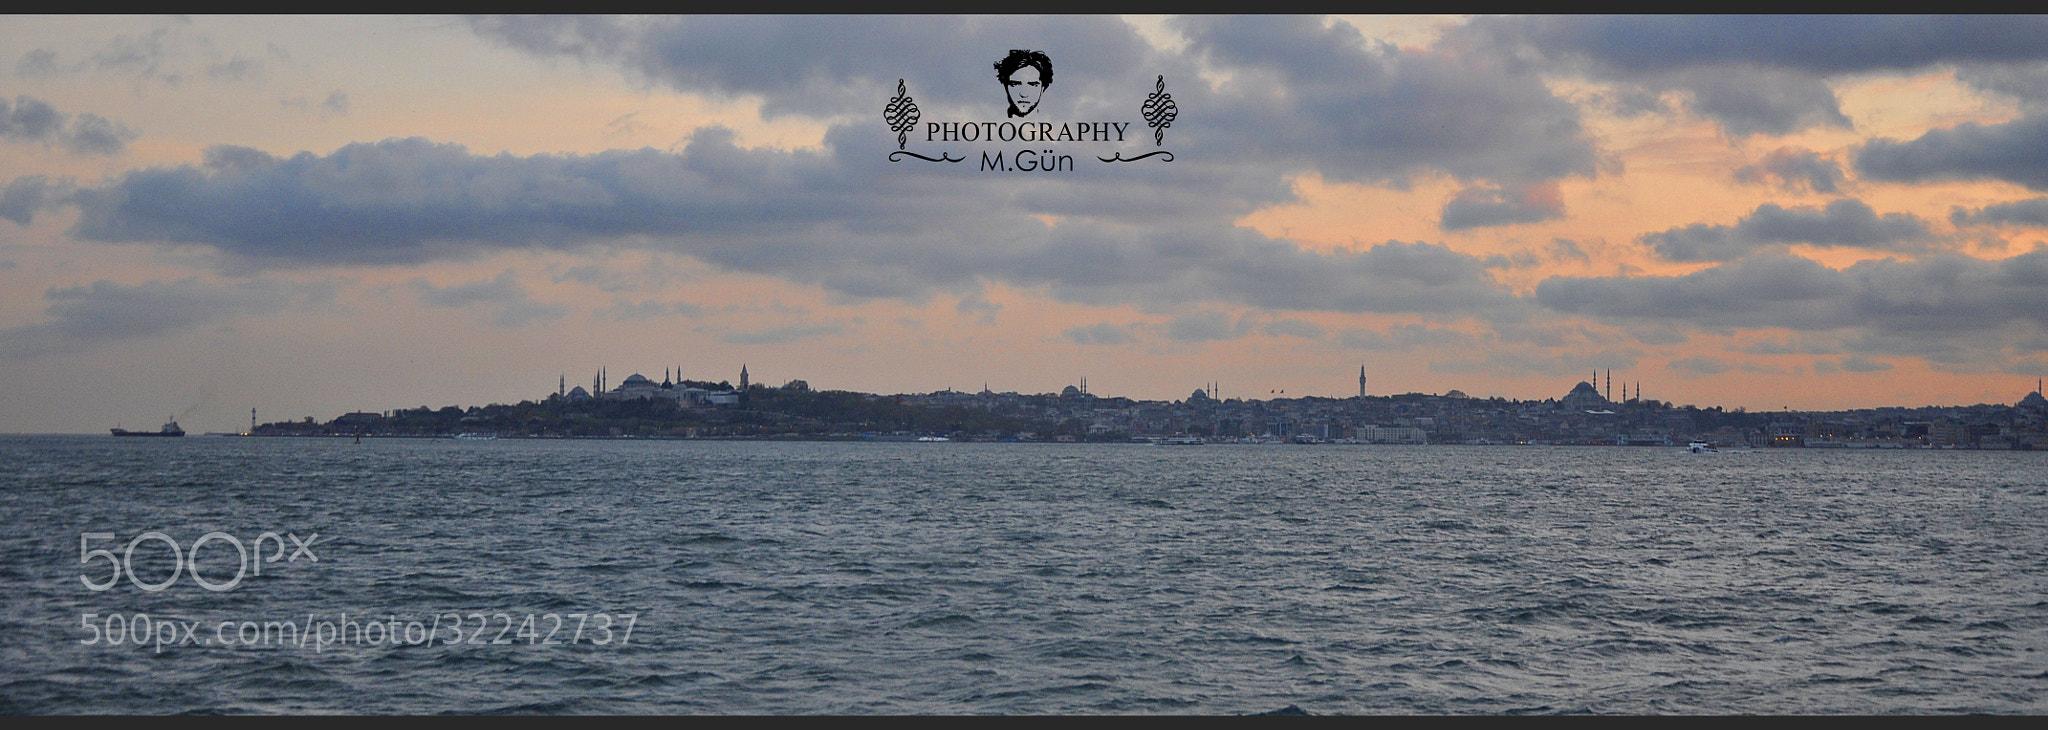 Photograph İstanbul  by Melih Gün on 500px